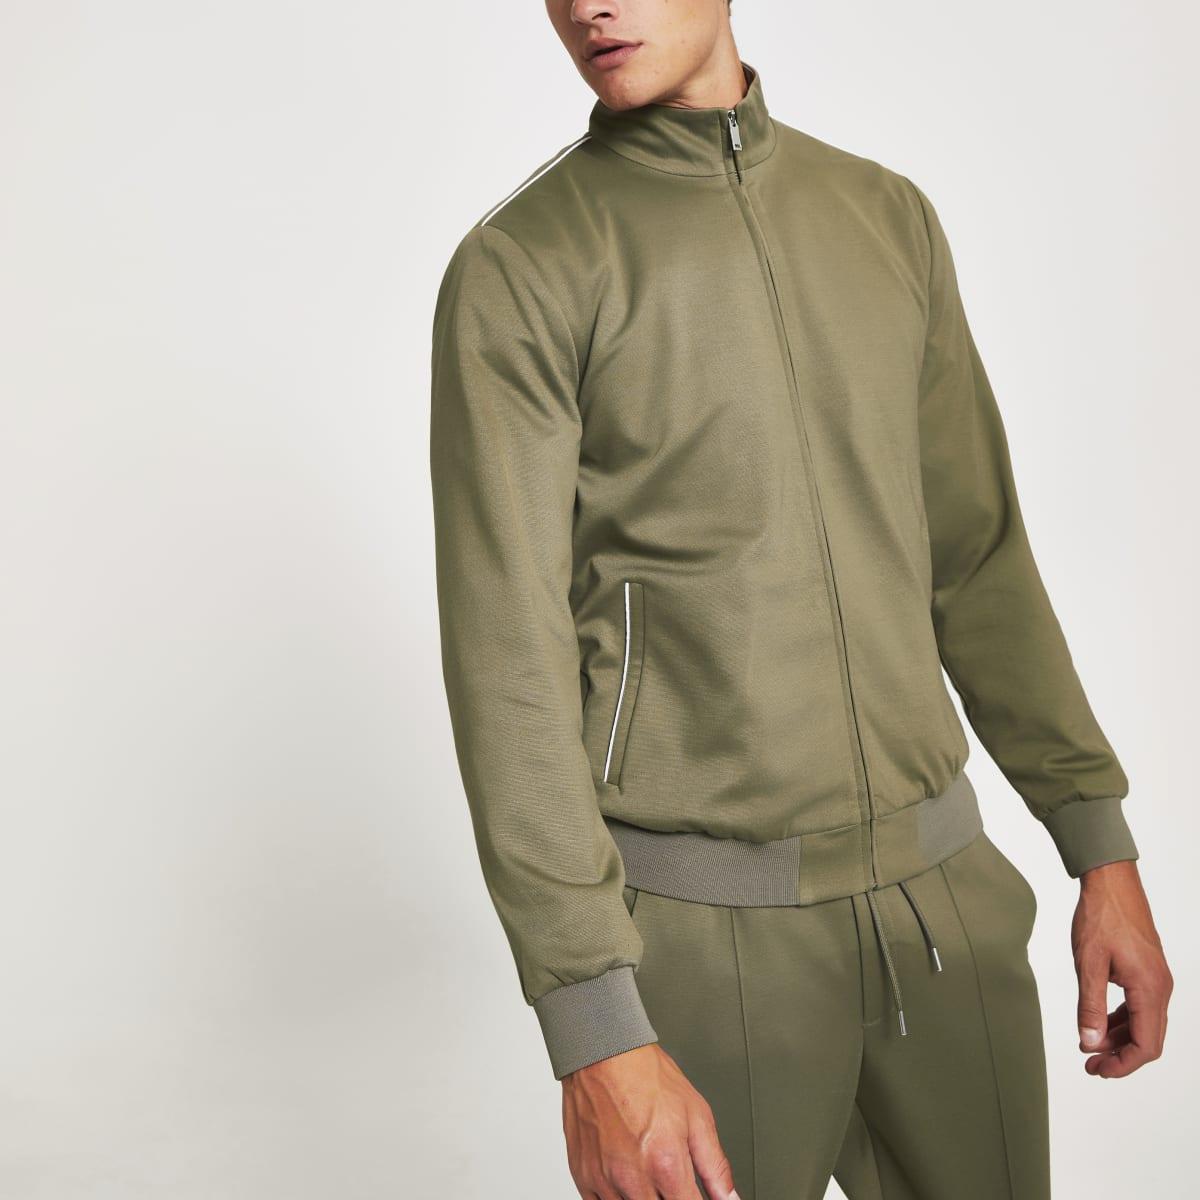 Maison Riviera khaki skinny bomber jacket